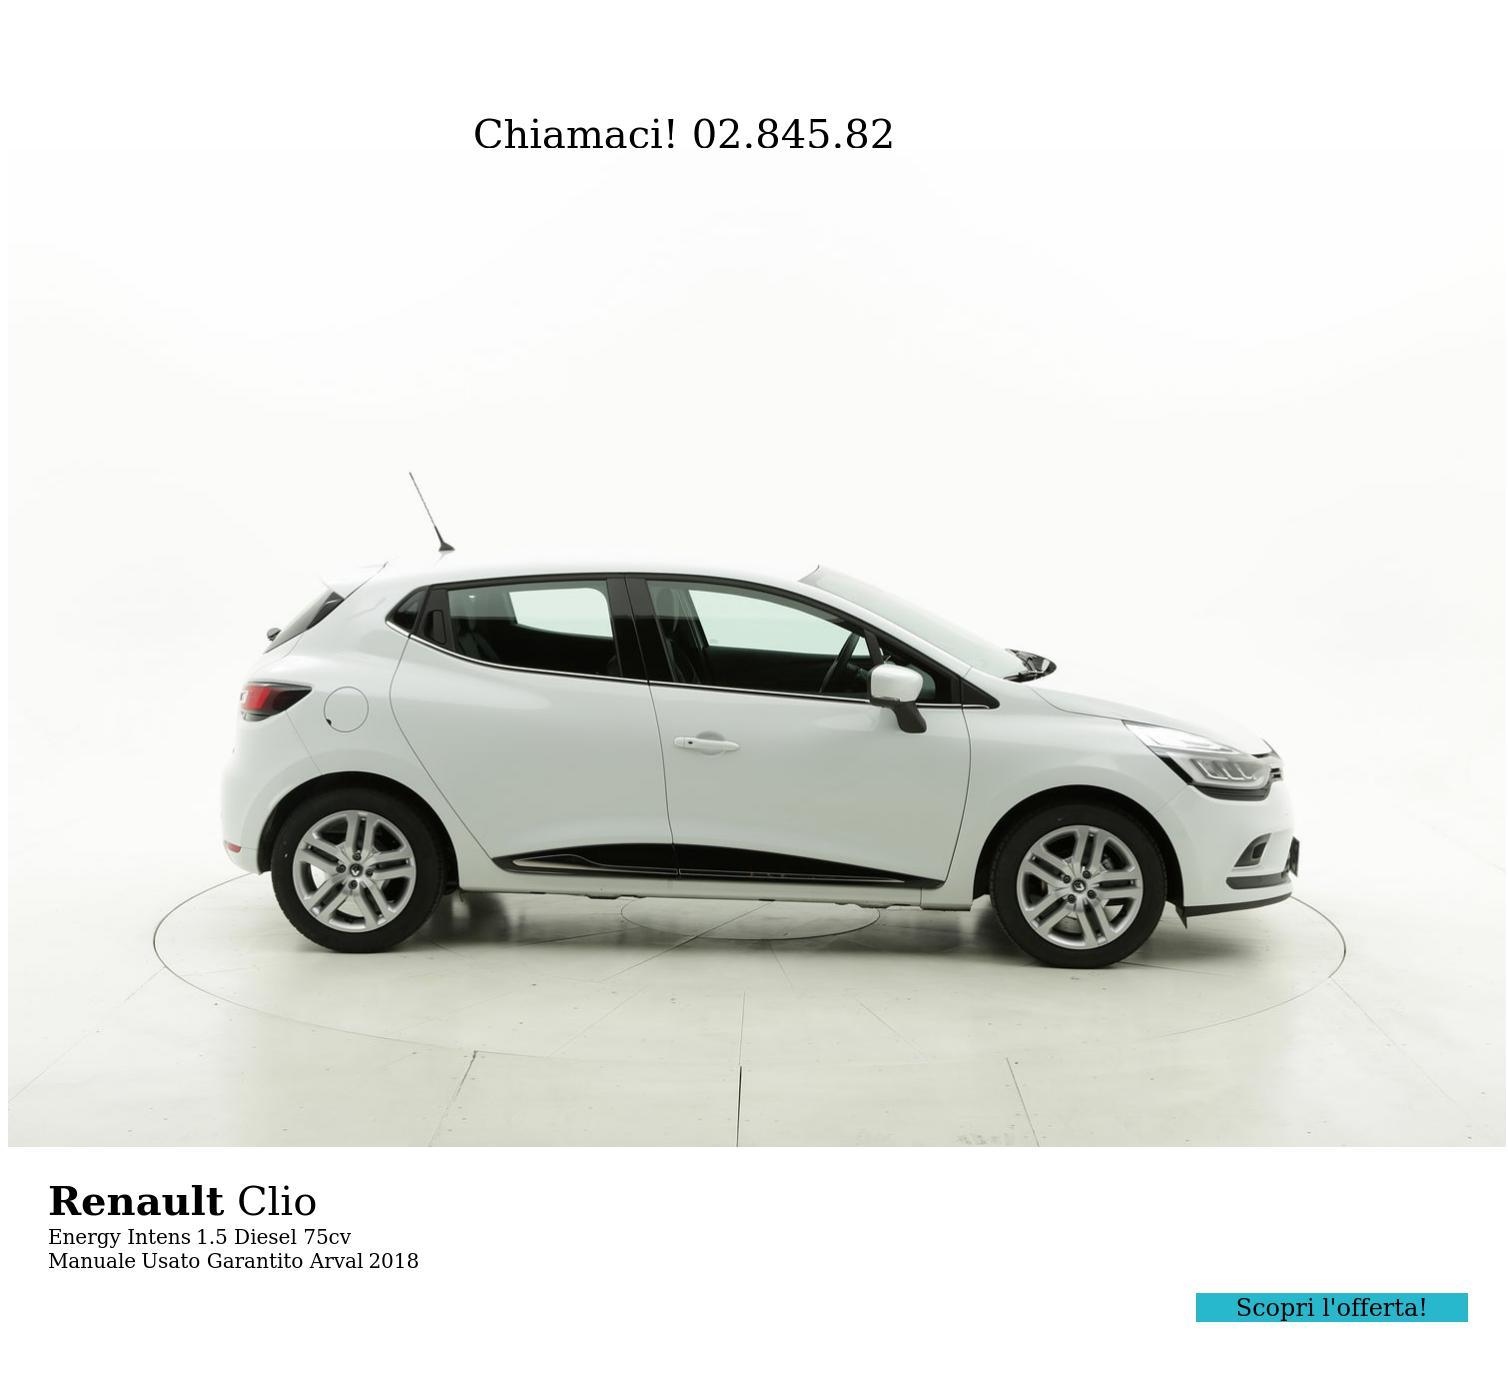 Renault Clio km 0 diesel bianca | brumbrum